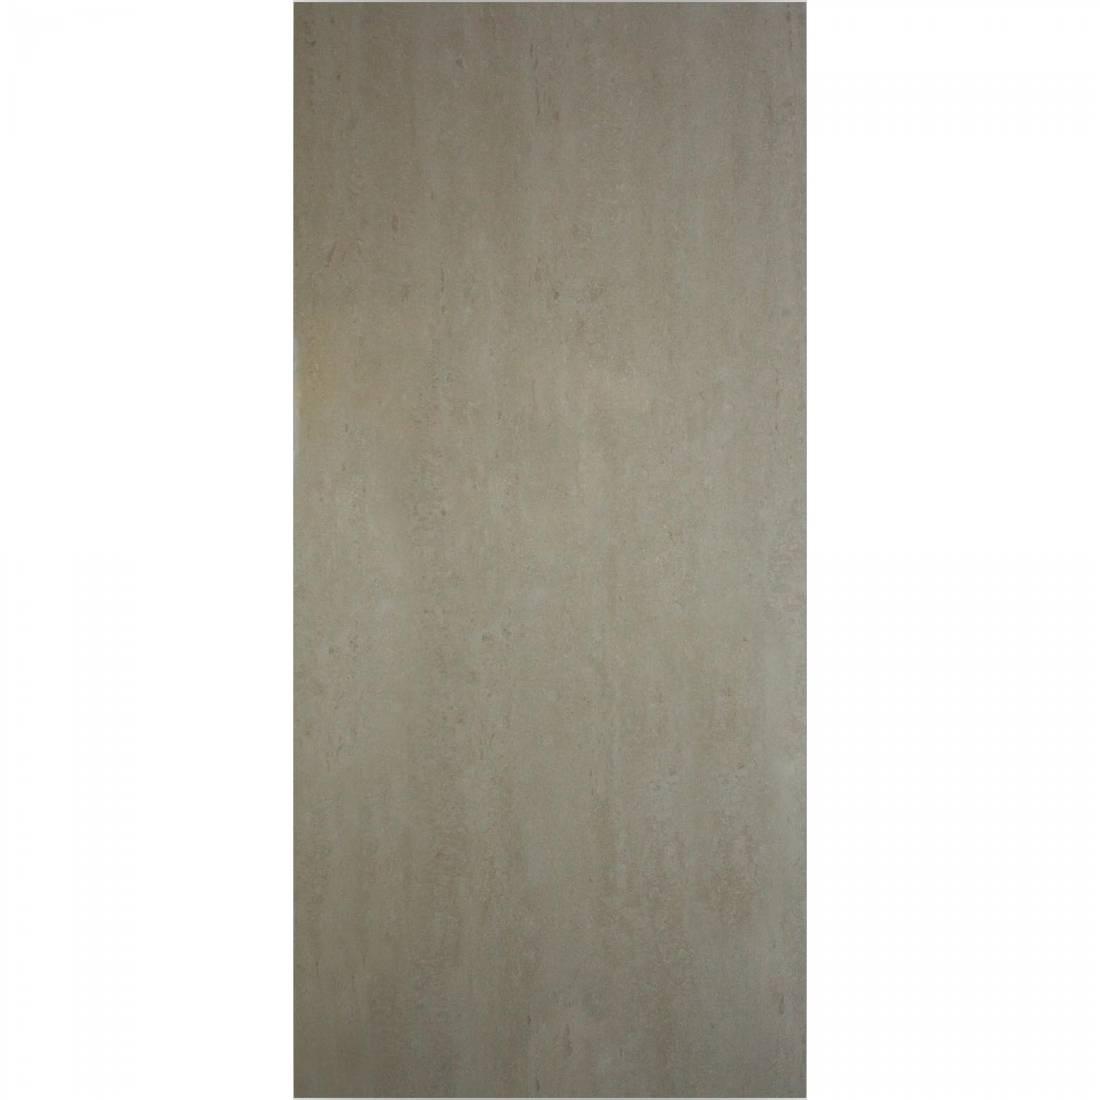 Trista 30x60 Ivory Gloss 1